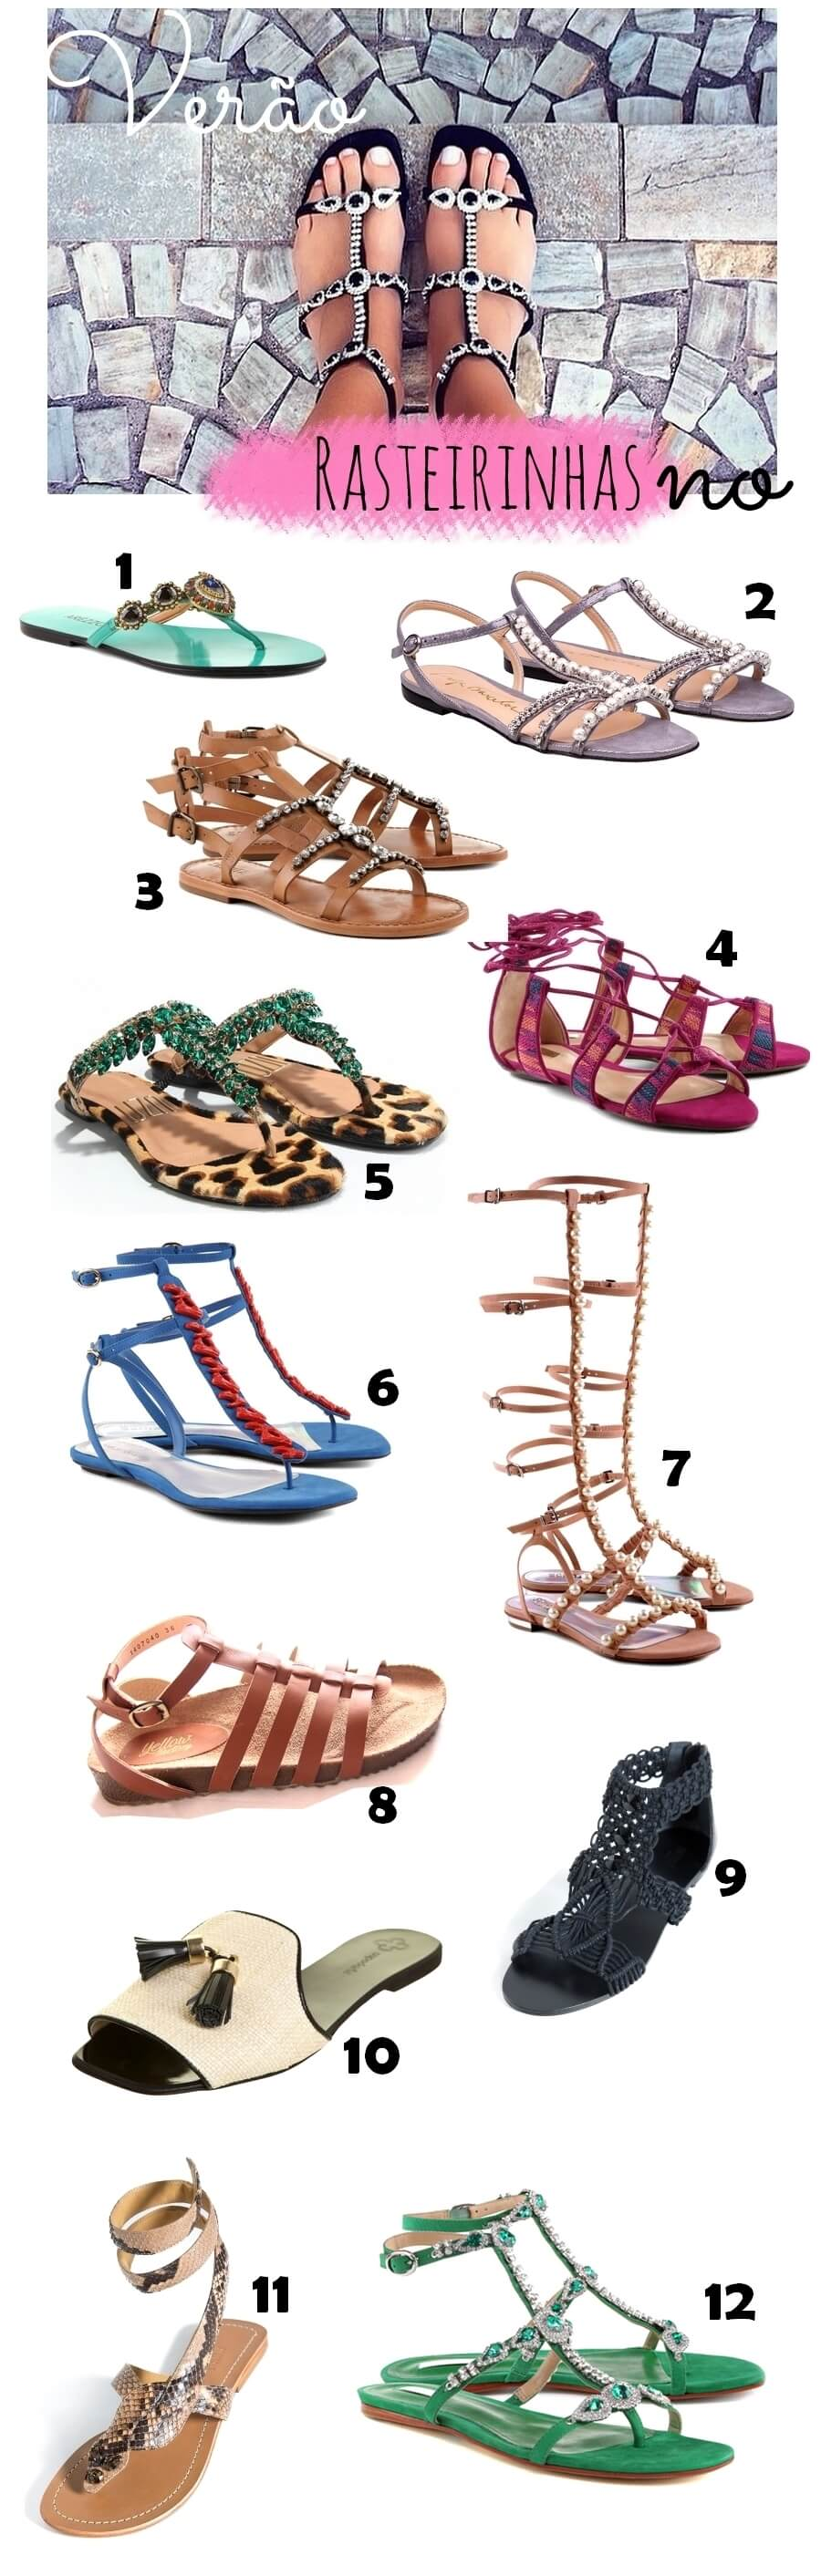 -rasteirinhas-schutz-arezzo-luiza-barcelos-shoes-stock-rasteirinha-uza-shoes-animale-luiza-barcelos-thassia-2015-tendencia-trend-sapato-da-moda